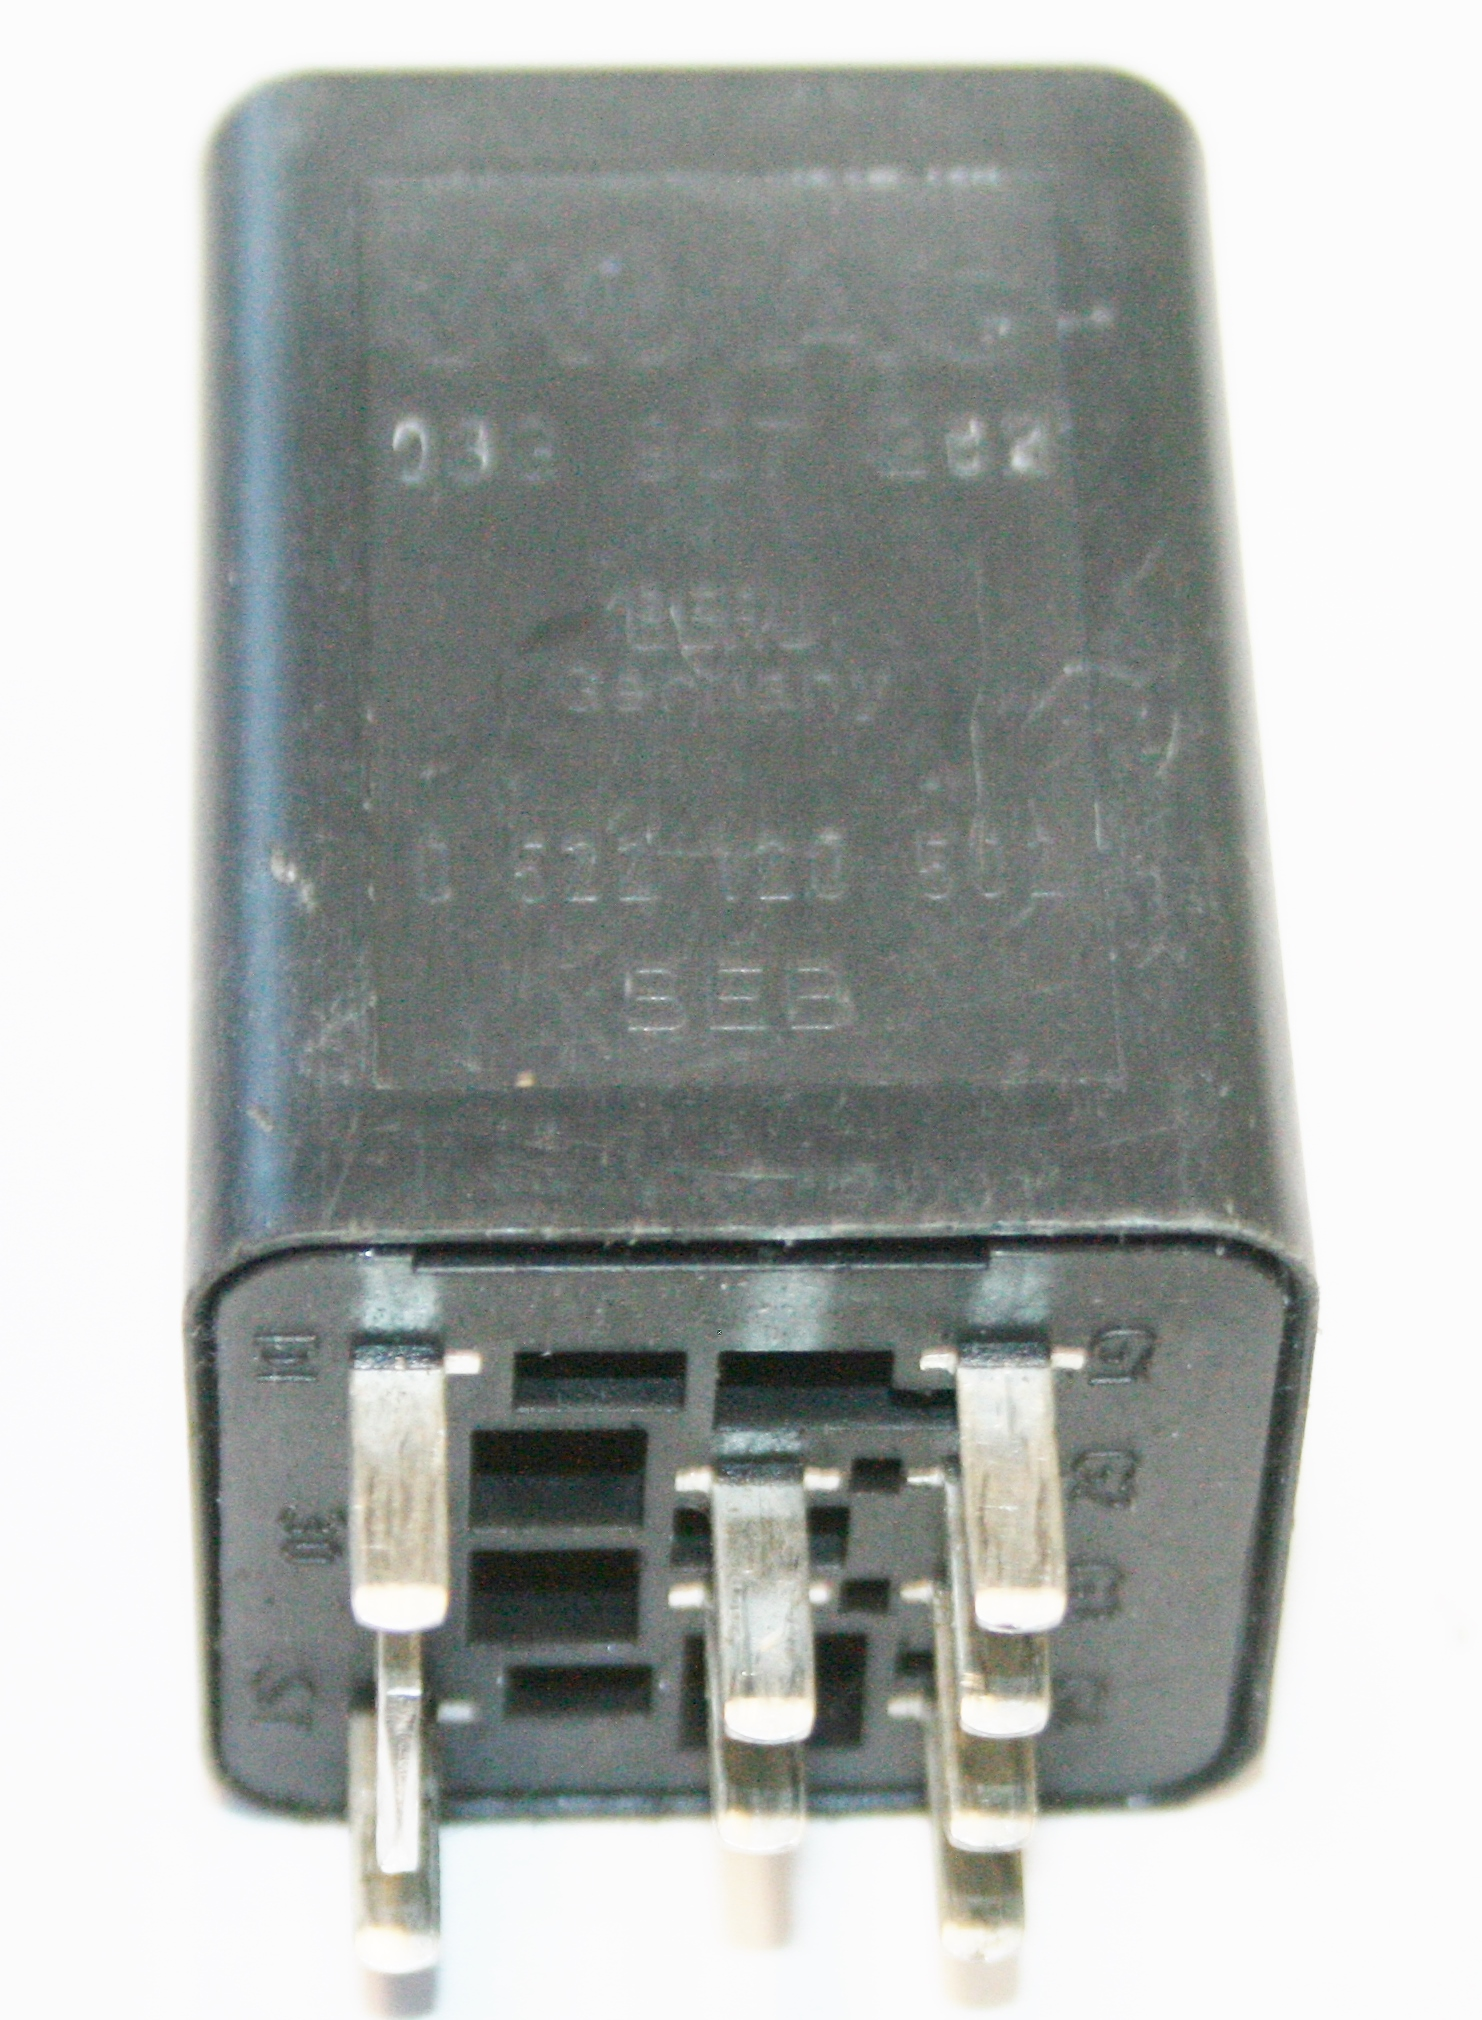 Used Genuine Vw Golf 461 Fan Control Relay 03g 907 282 Uks No1 Relay2999